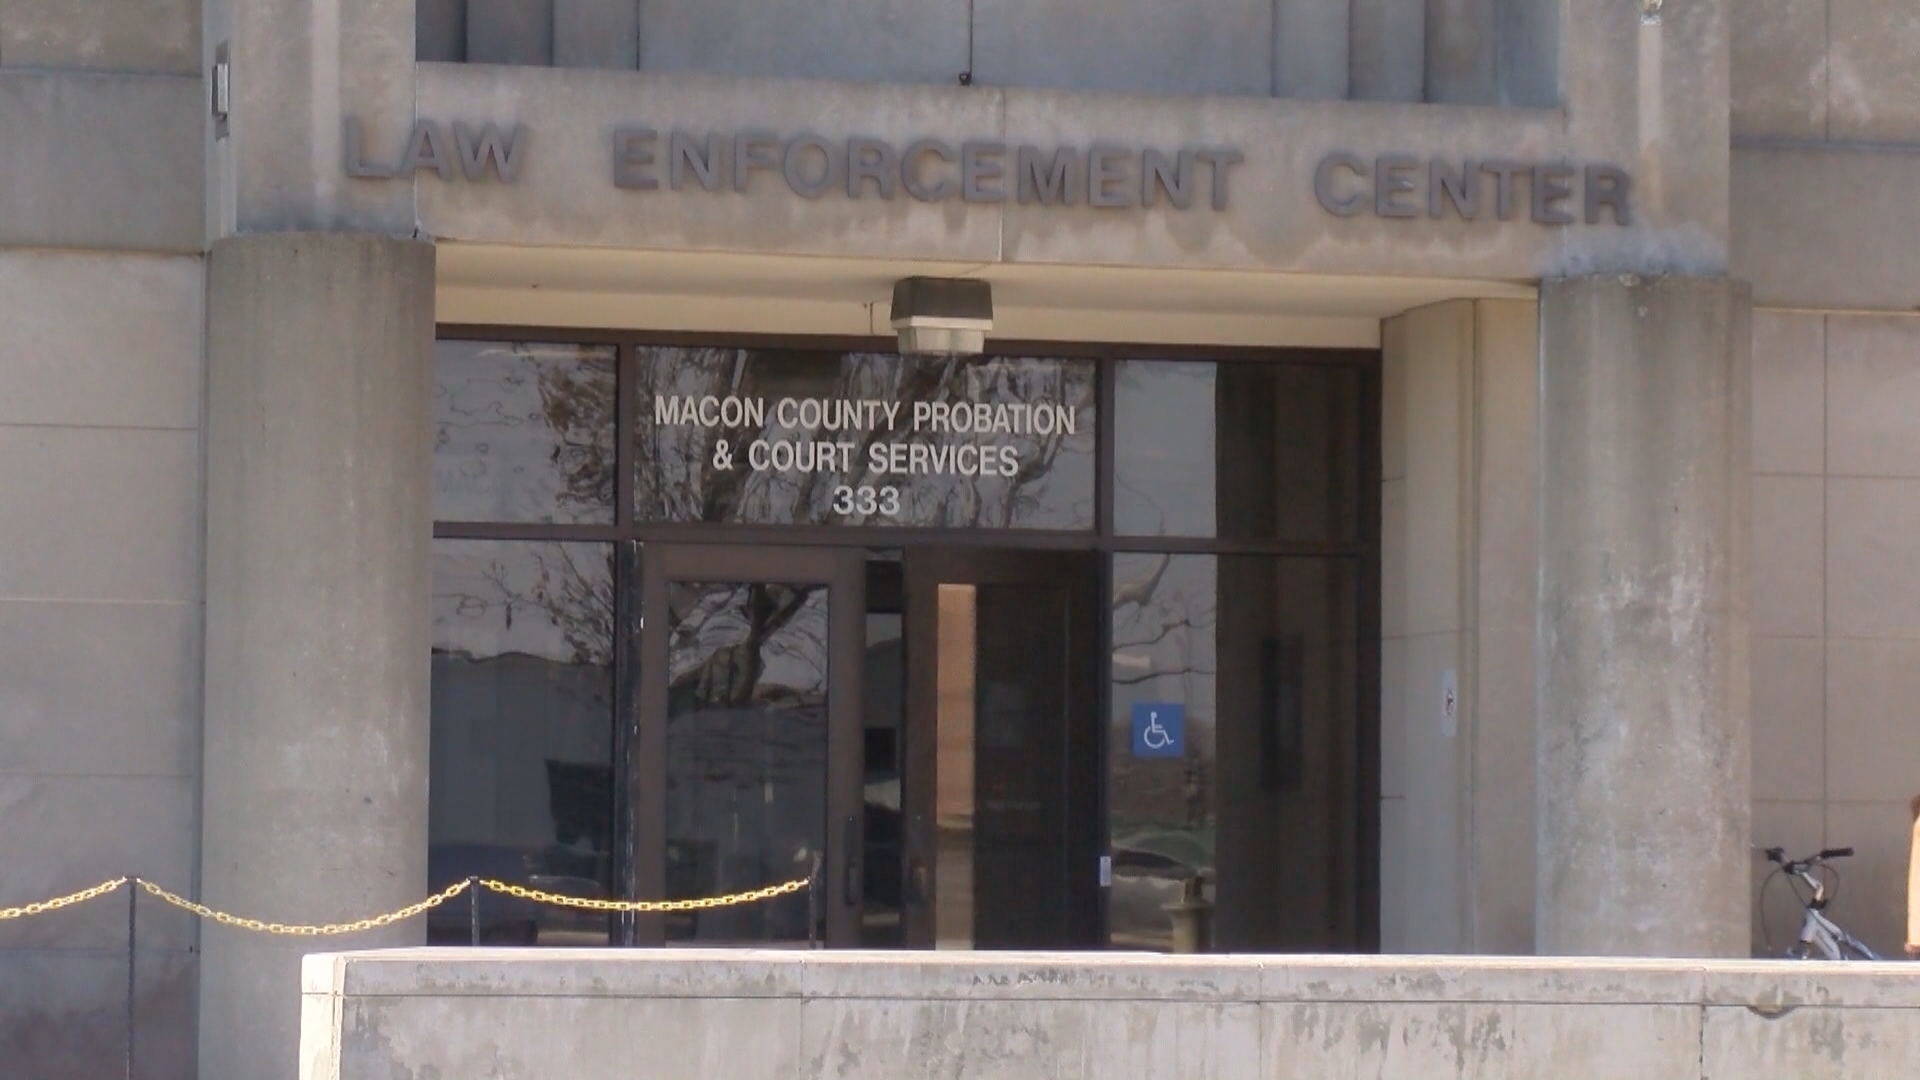 macon county law enforcement center_1544654367442.jpg.jpg